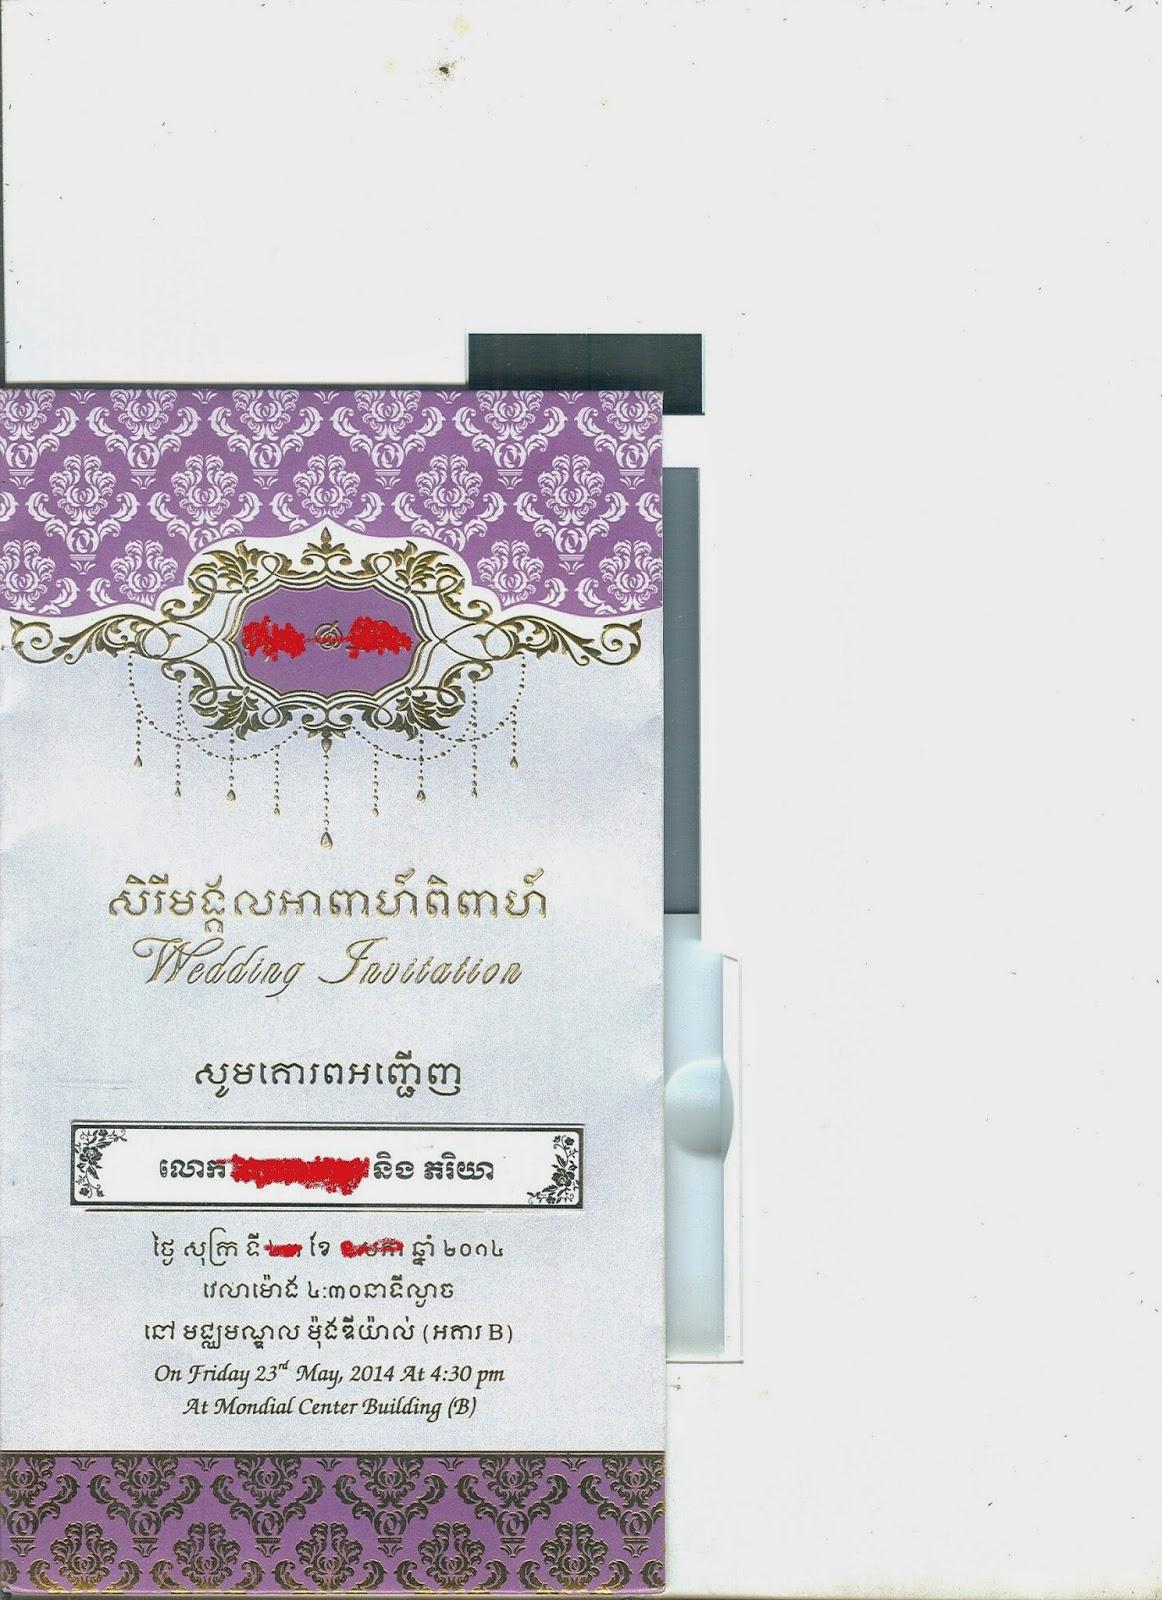 Khmer Wedding Design Greeting Card | Dangkorpost - The Cambodian ...